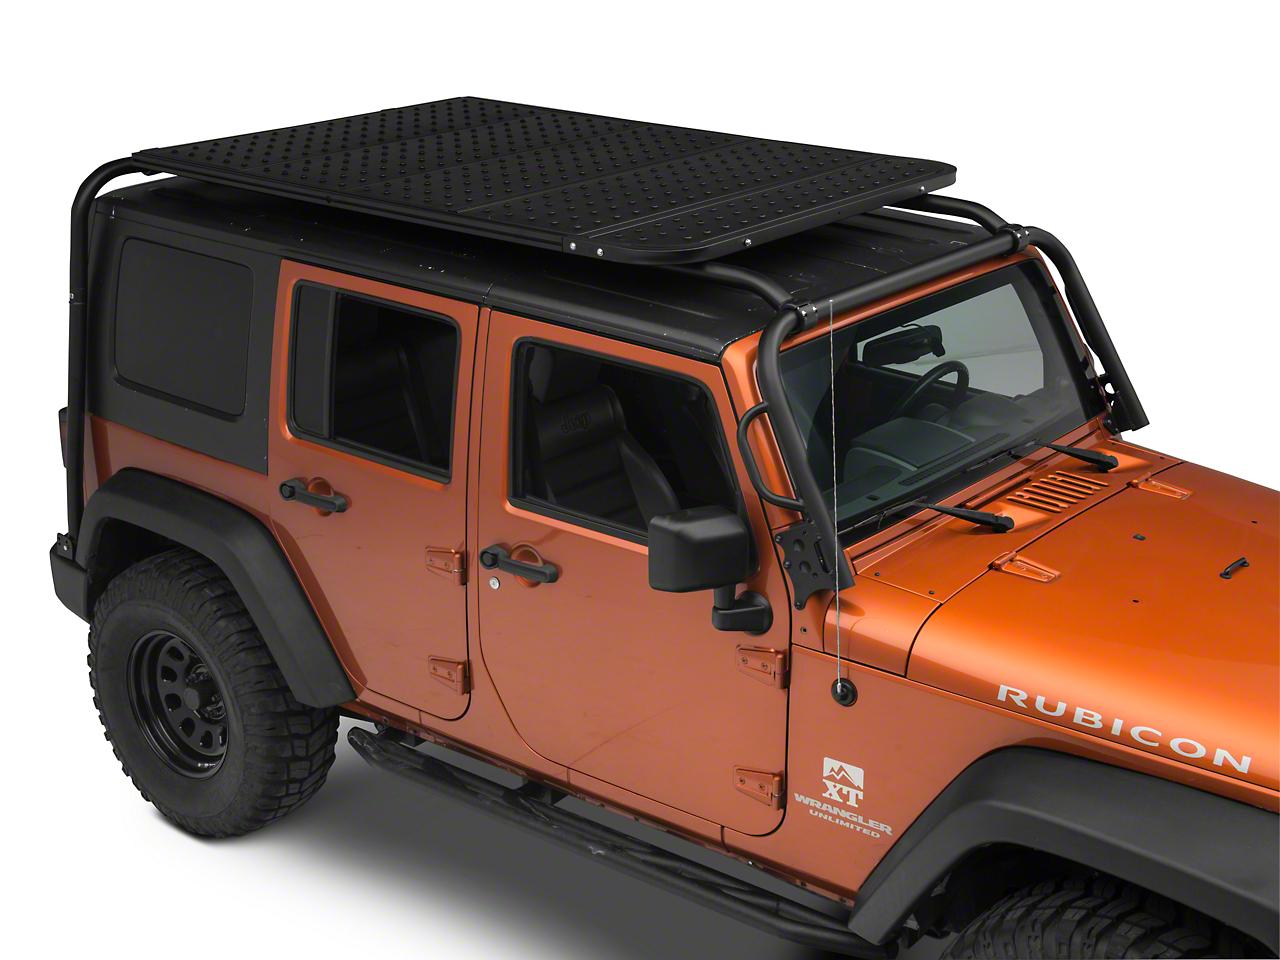 Kargo Master Mod-Rak EXP System (07-18 Jeep Wrangler JK 4 Door)